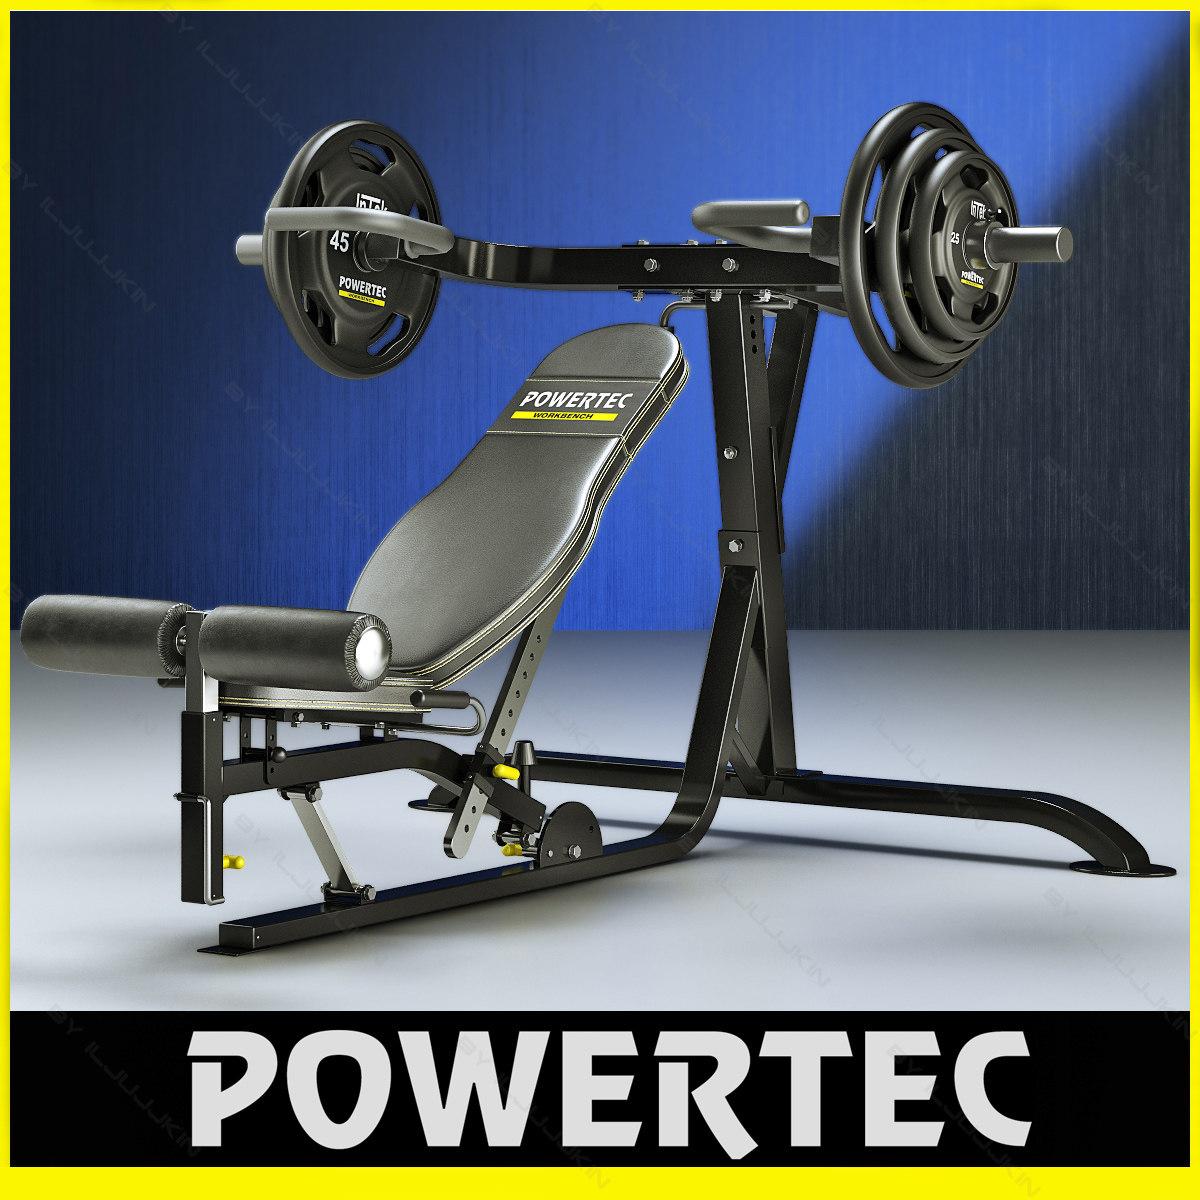 powertec l-mp10 multi press 3d model